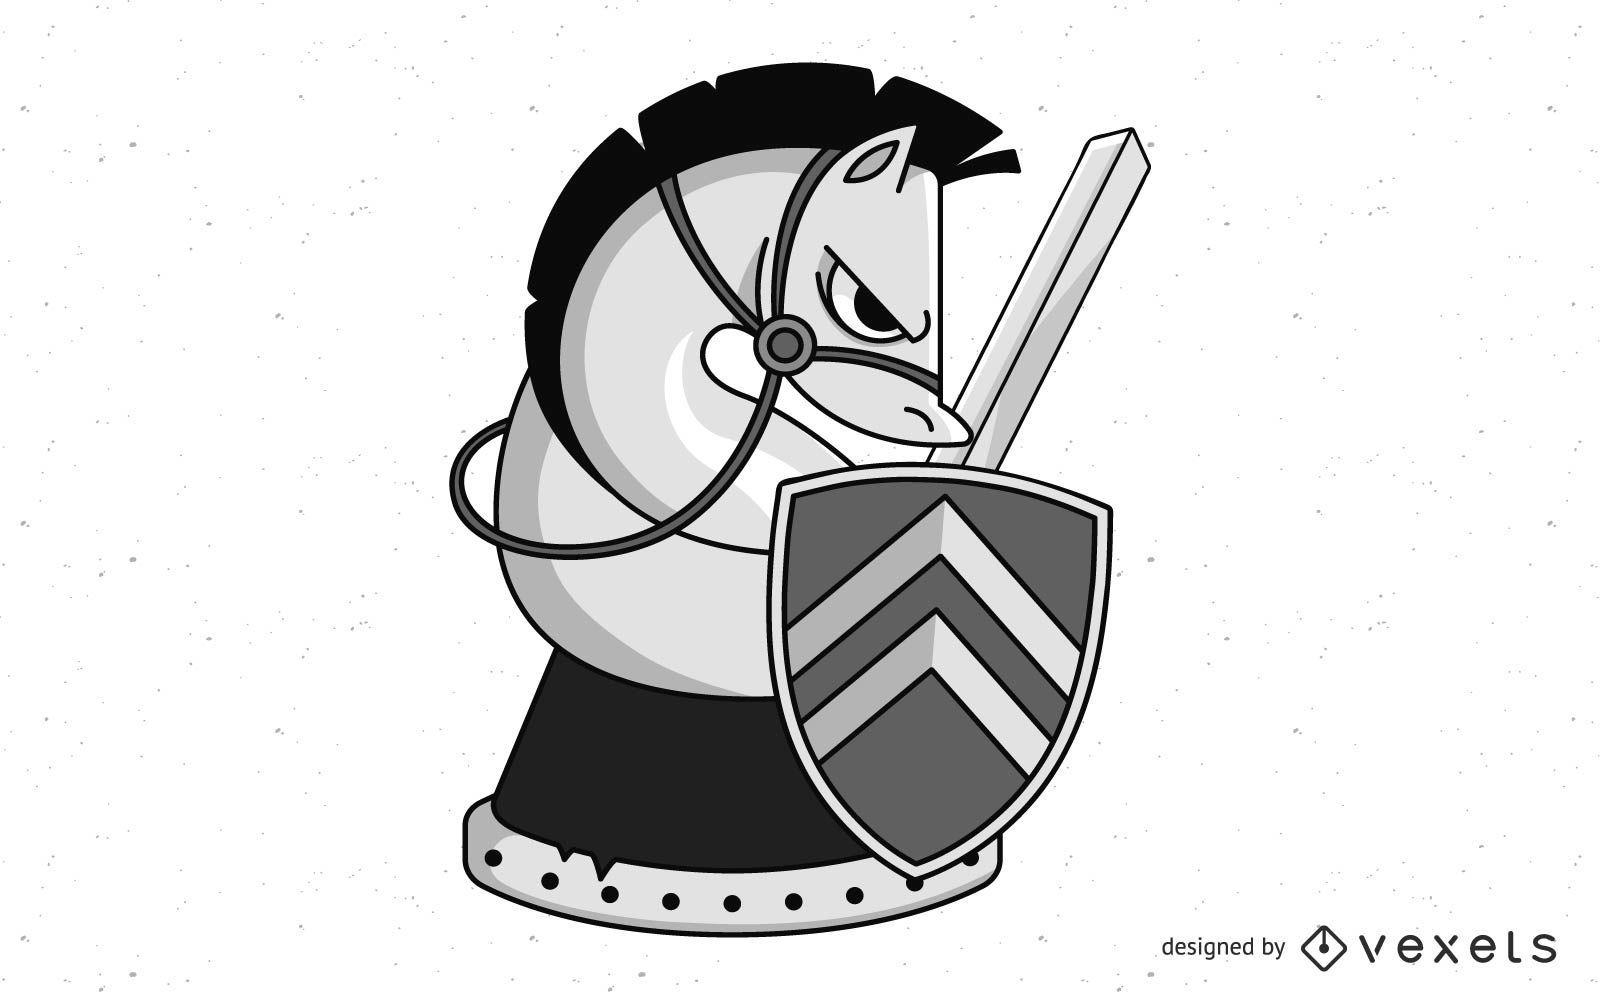 Diseño de pieza de caballo de caballero de ajedrez